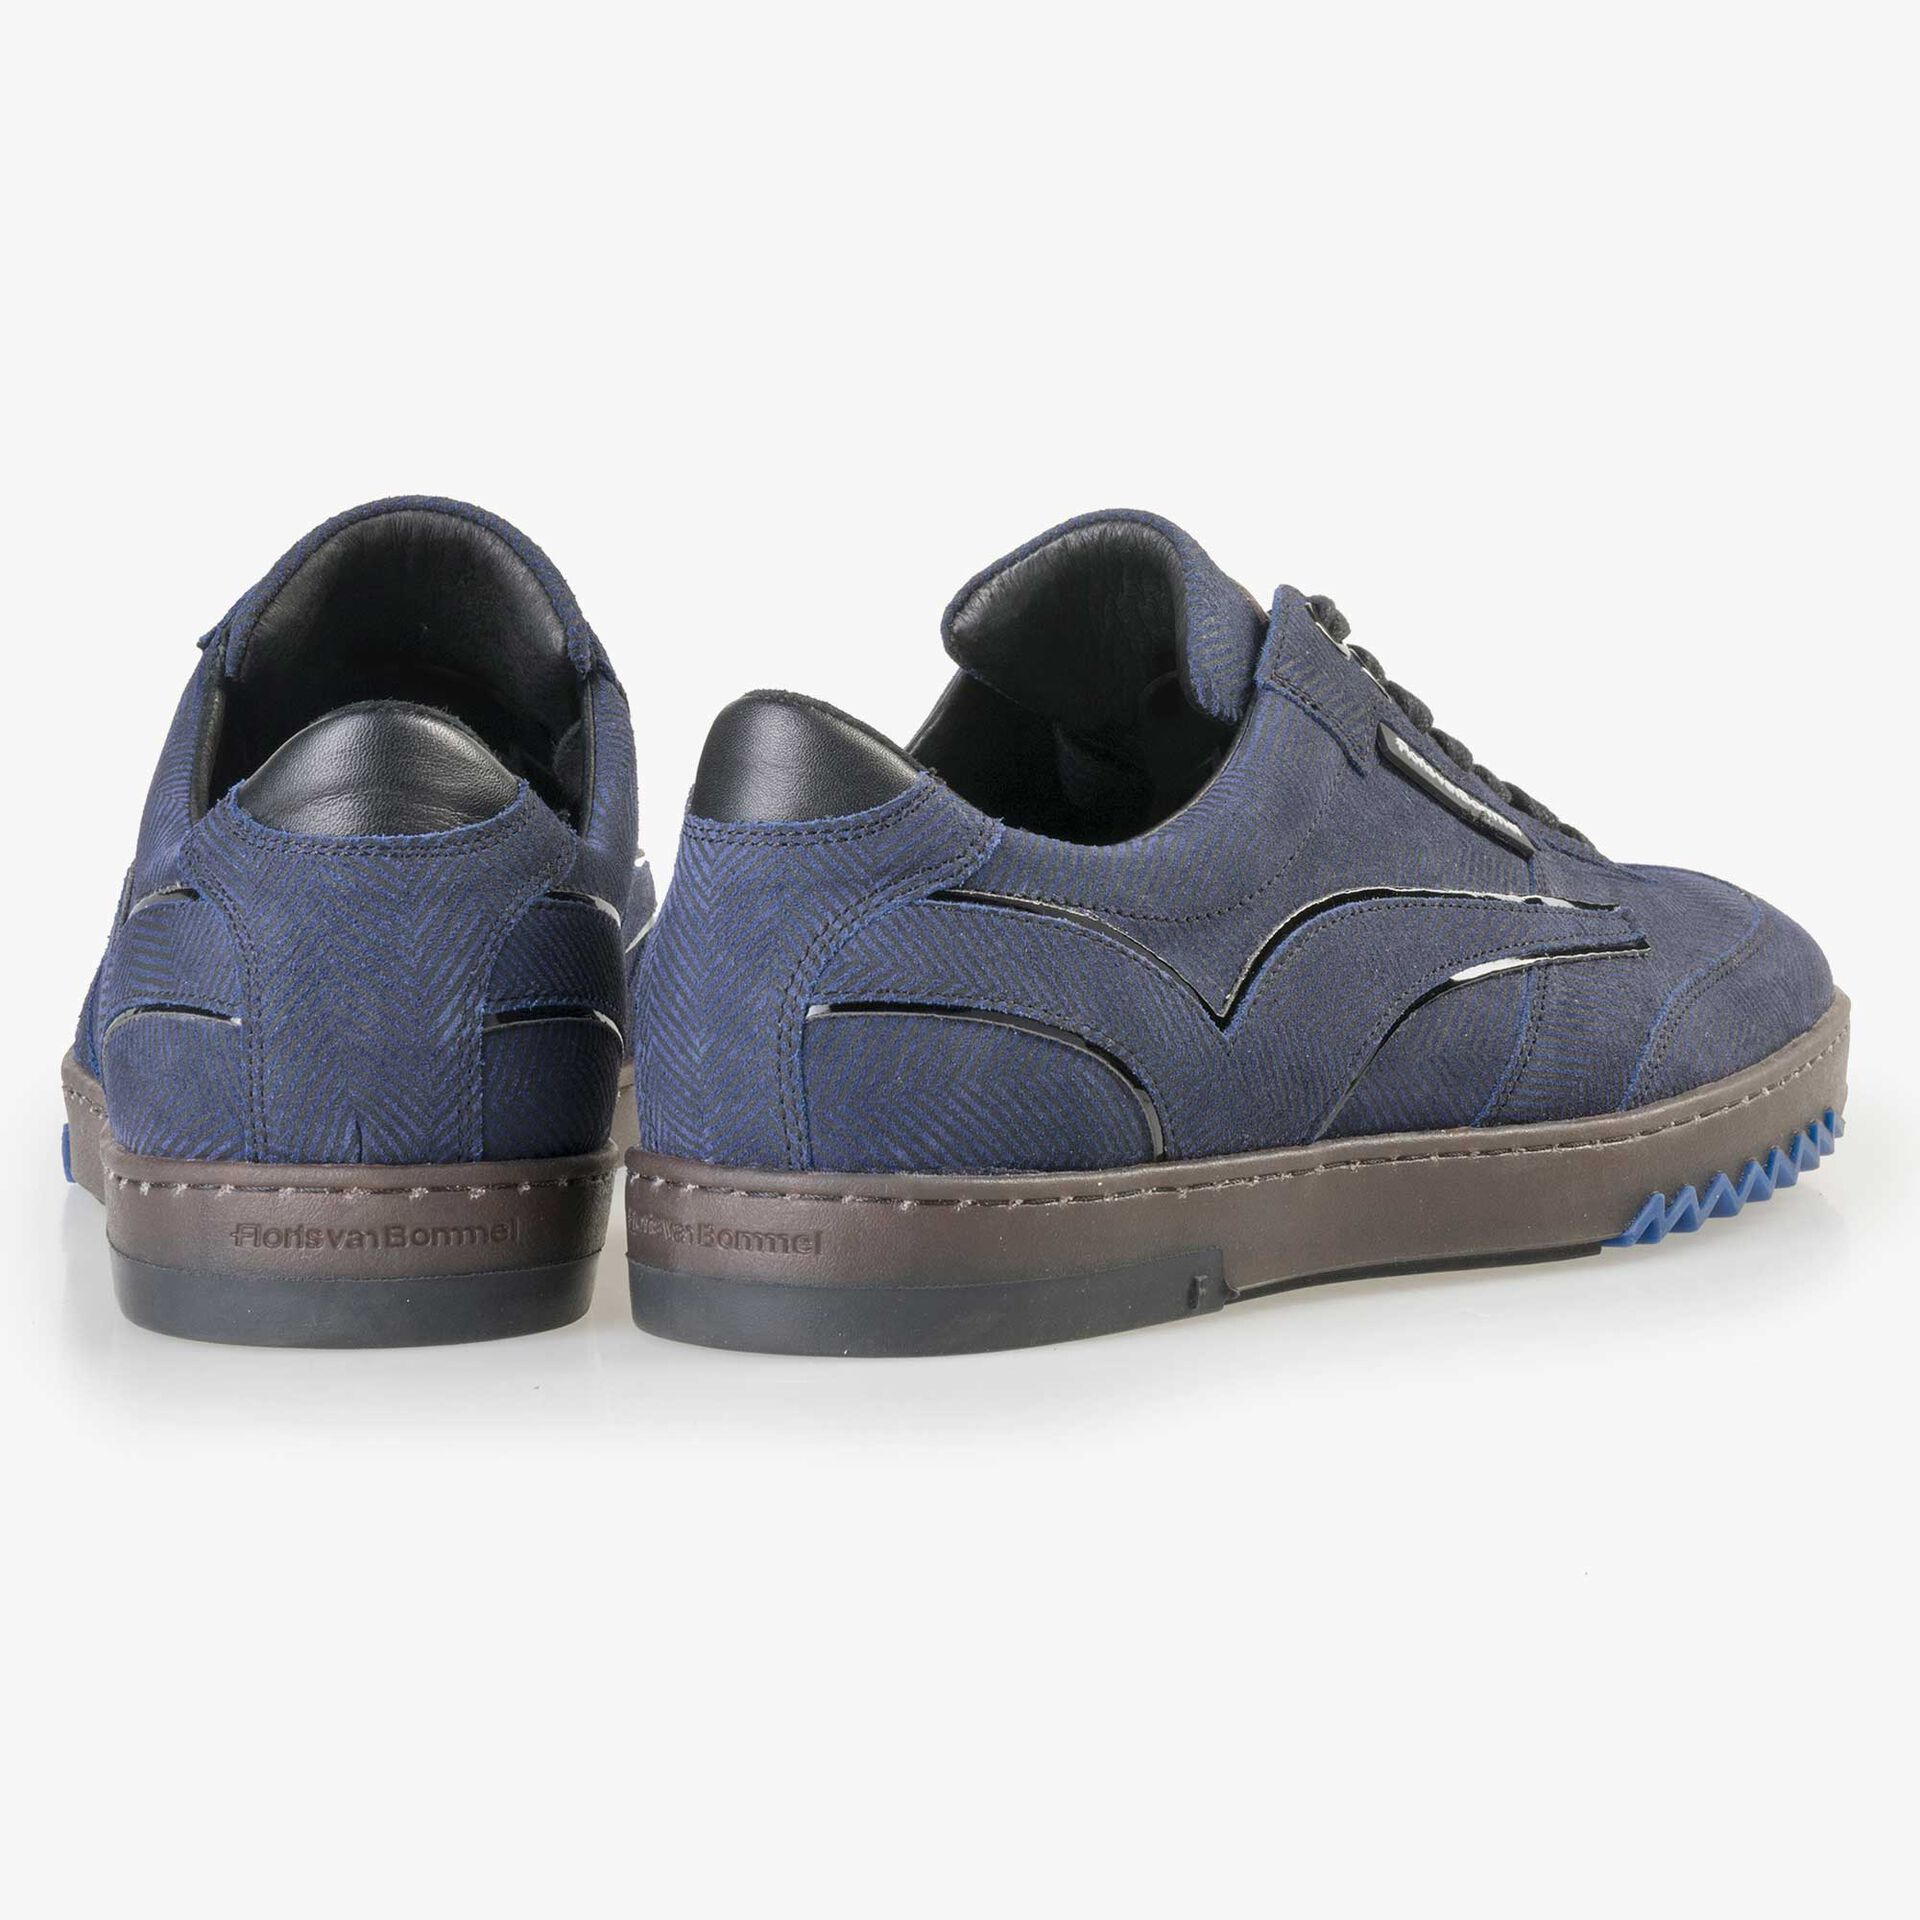 Floris van Bommel men's blue suede leather sneaker finished with a herringbone print